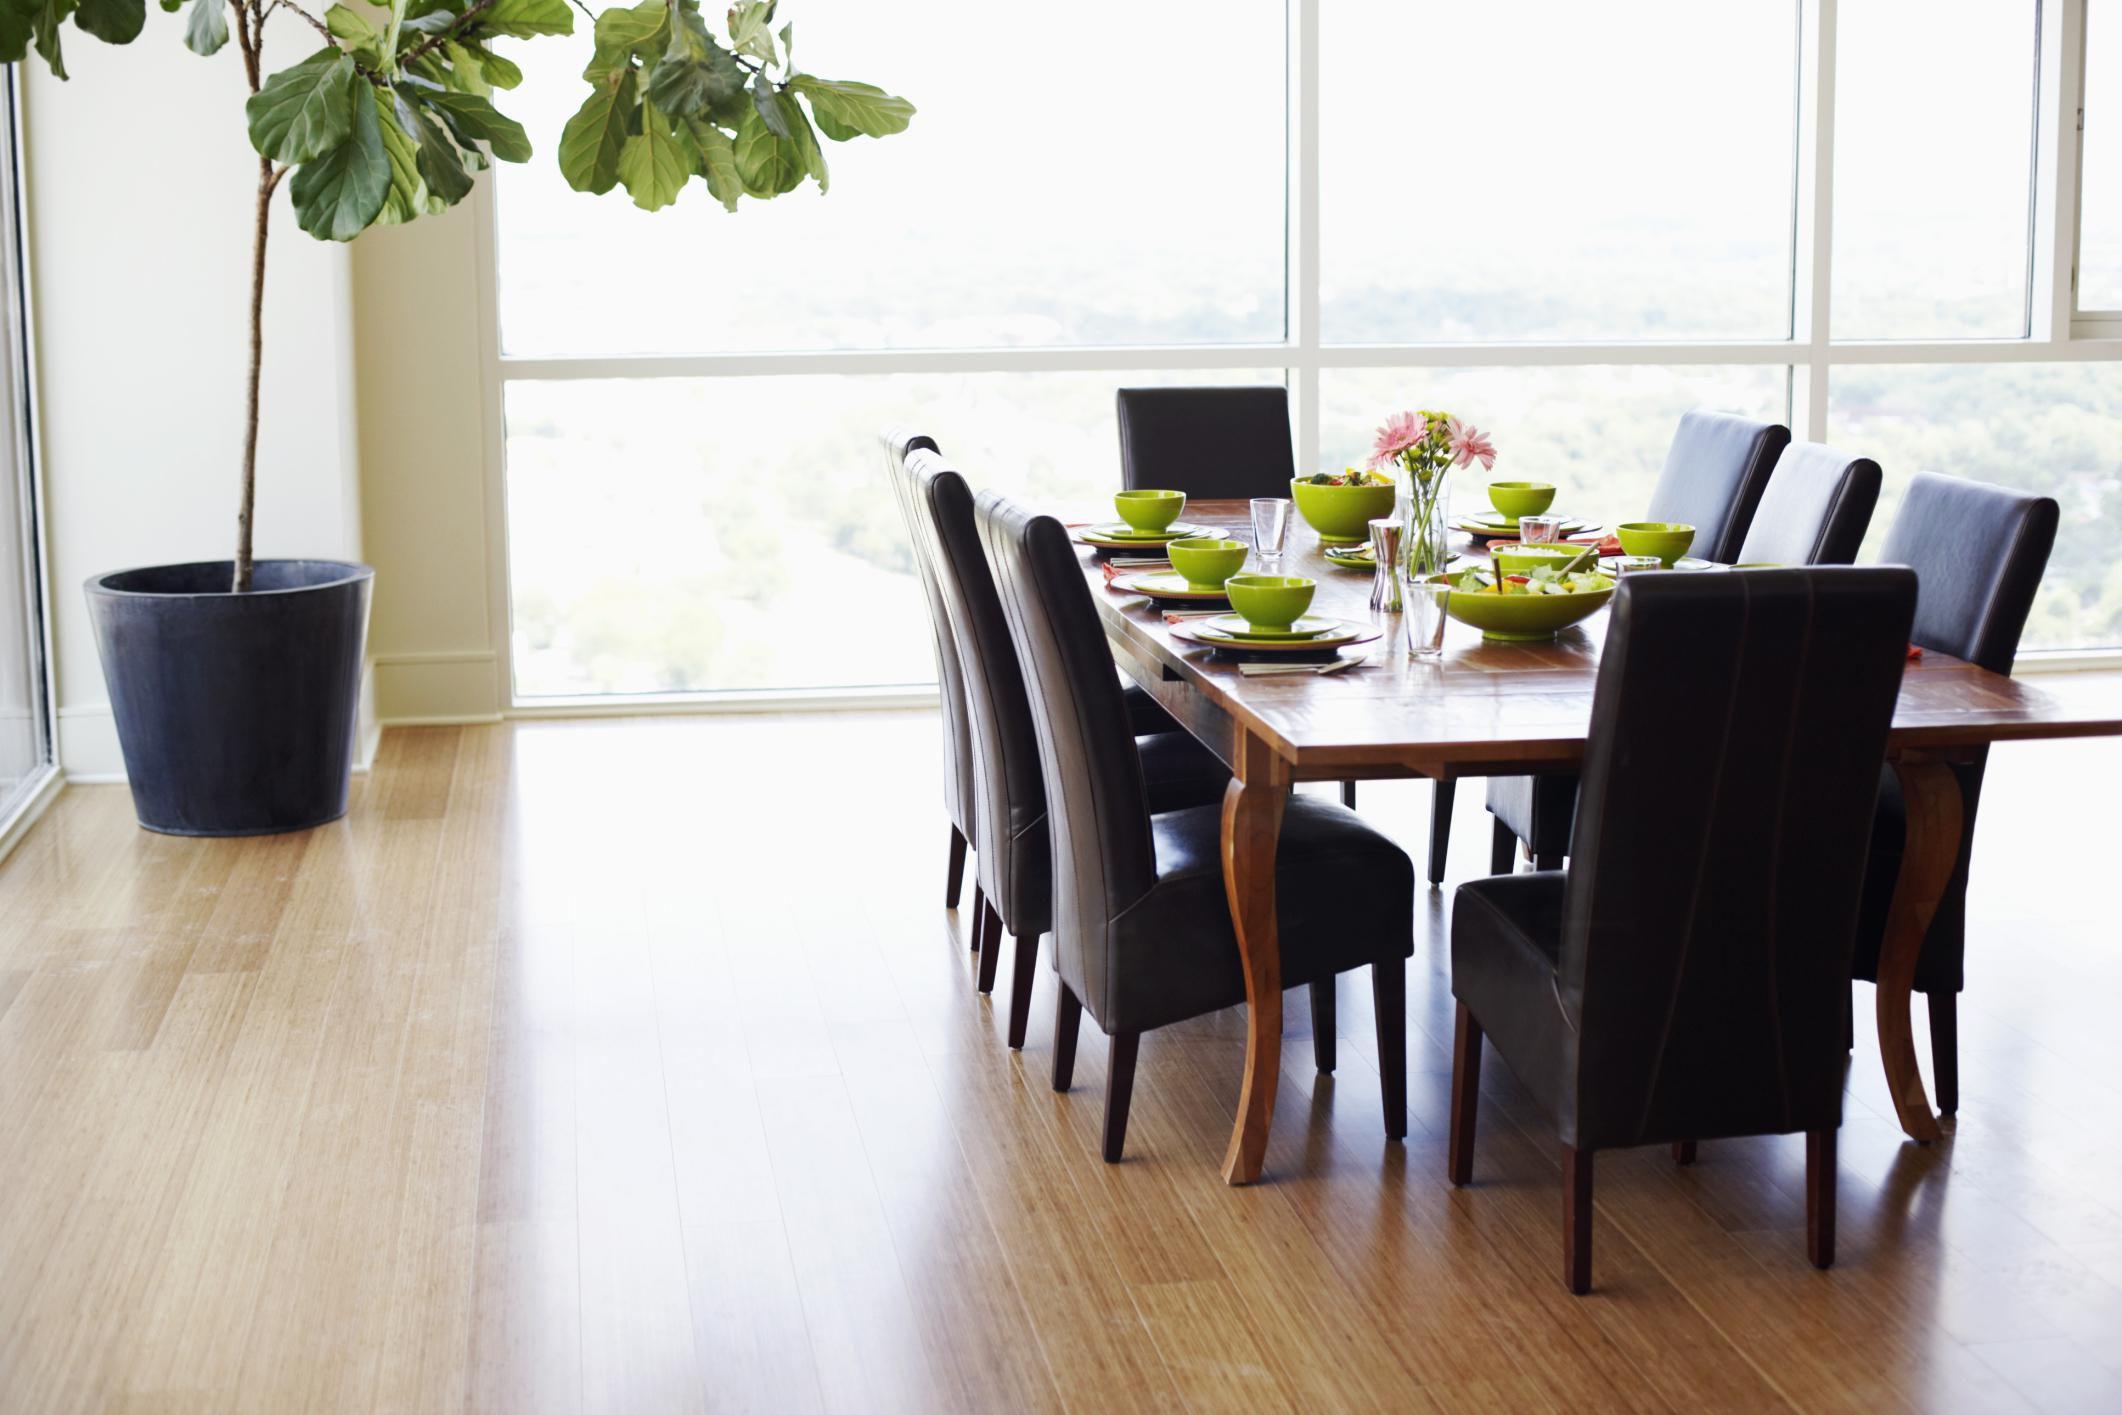 Benefits Of Laminate Flooring Laminate Flooring Benefits And Drawbacks